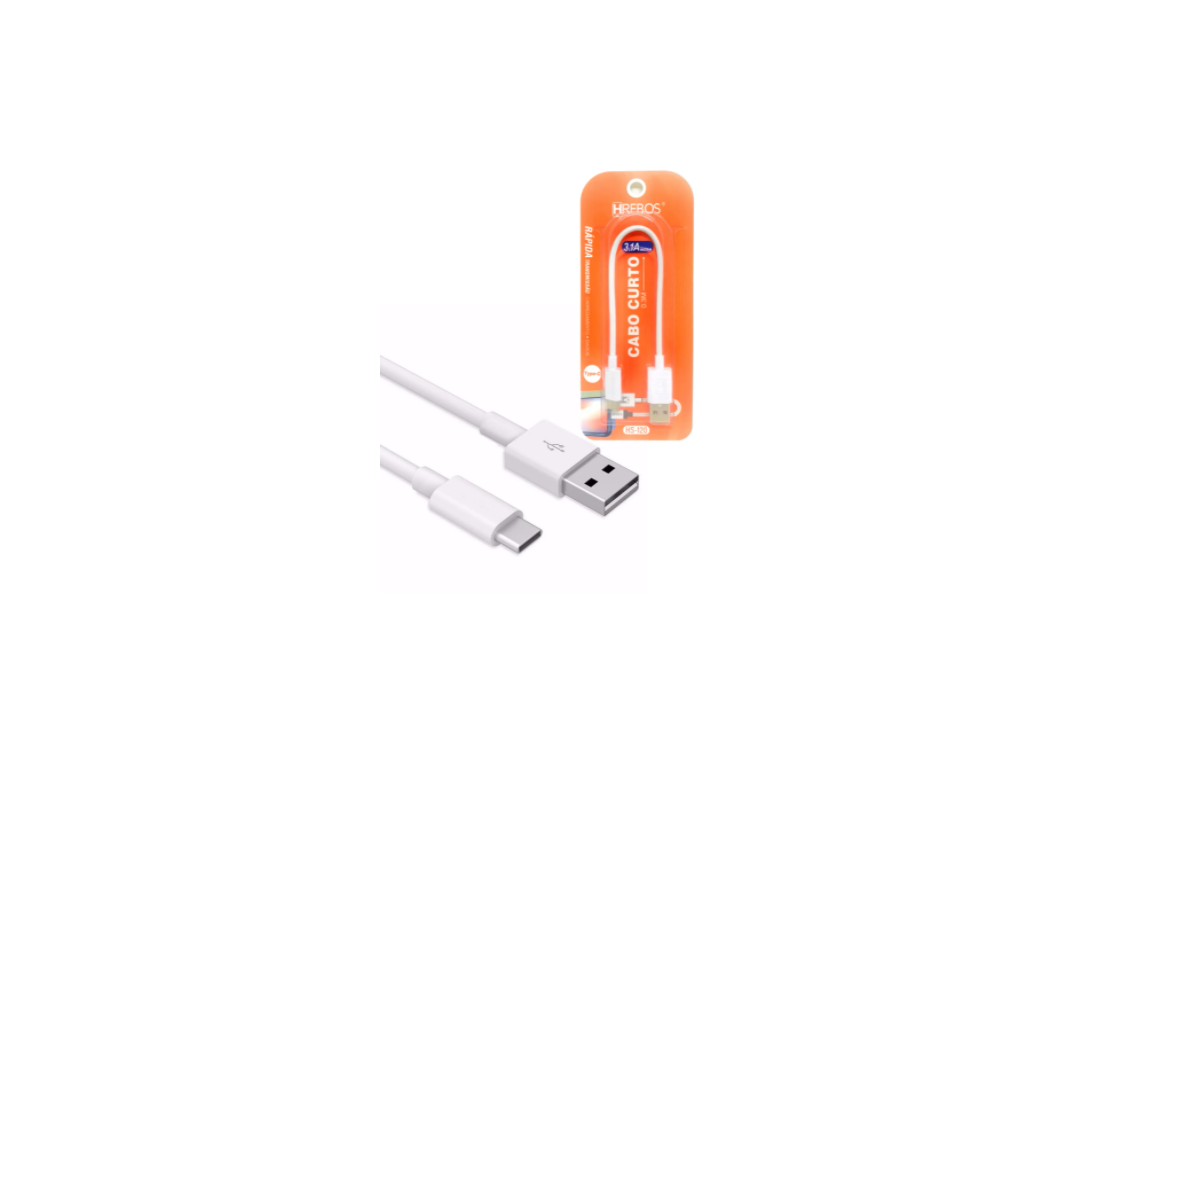 CABO USB TIPO C 25CM HREBOS TYPE-C 3.1A HS-120